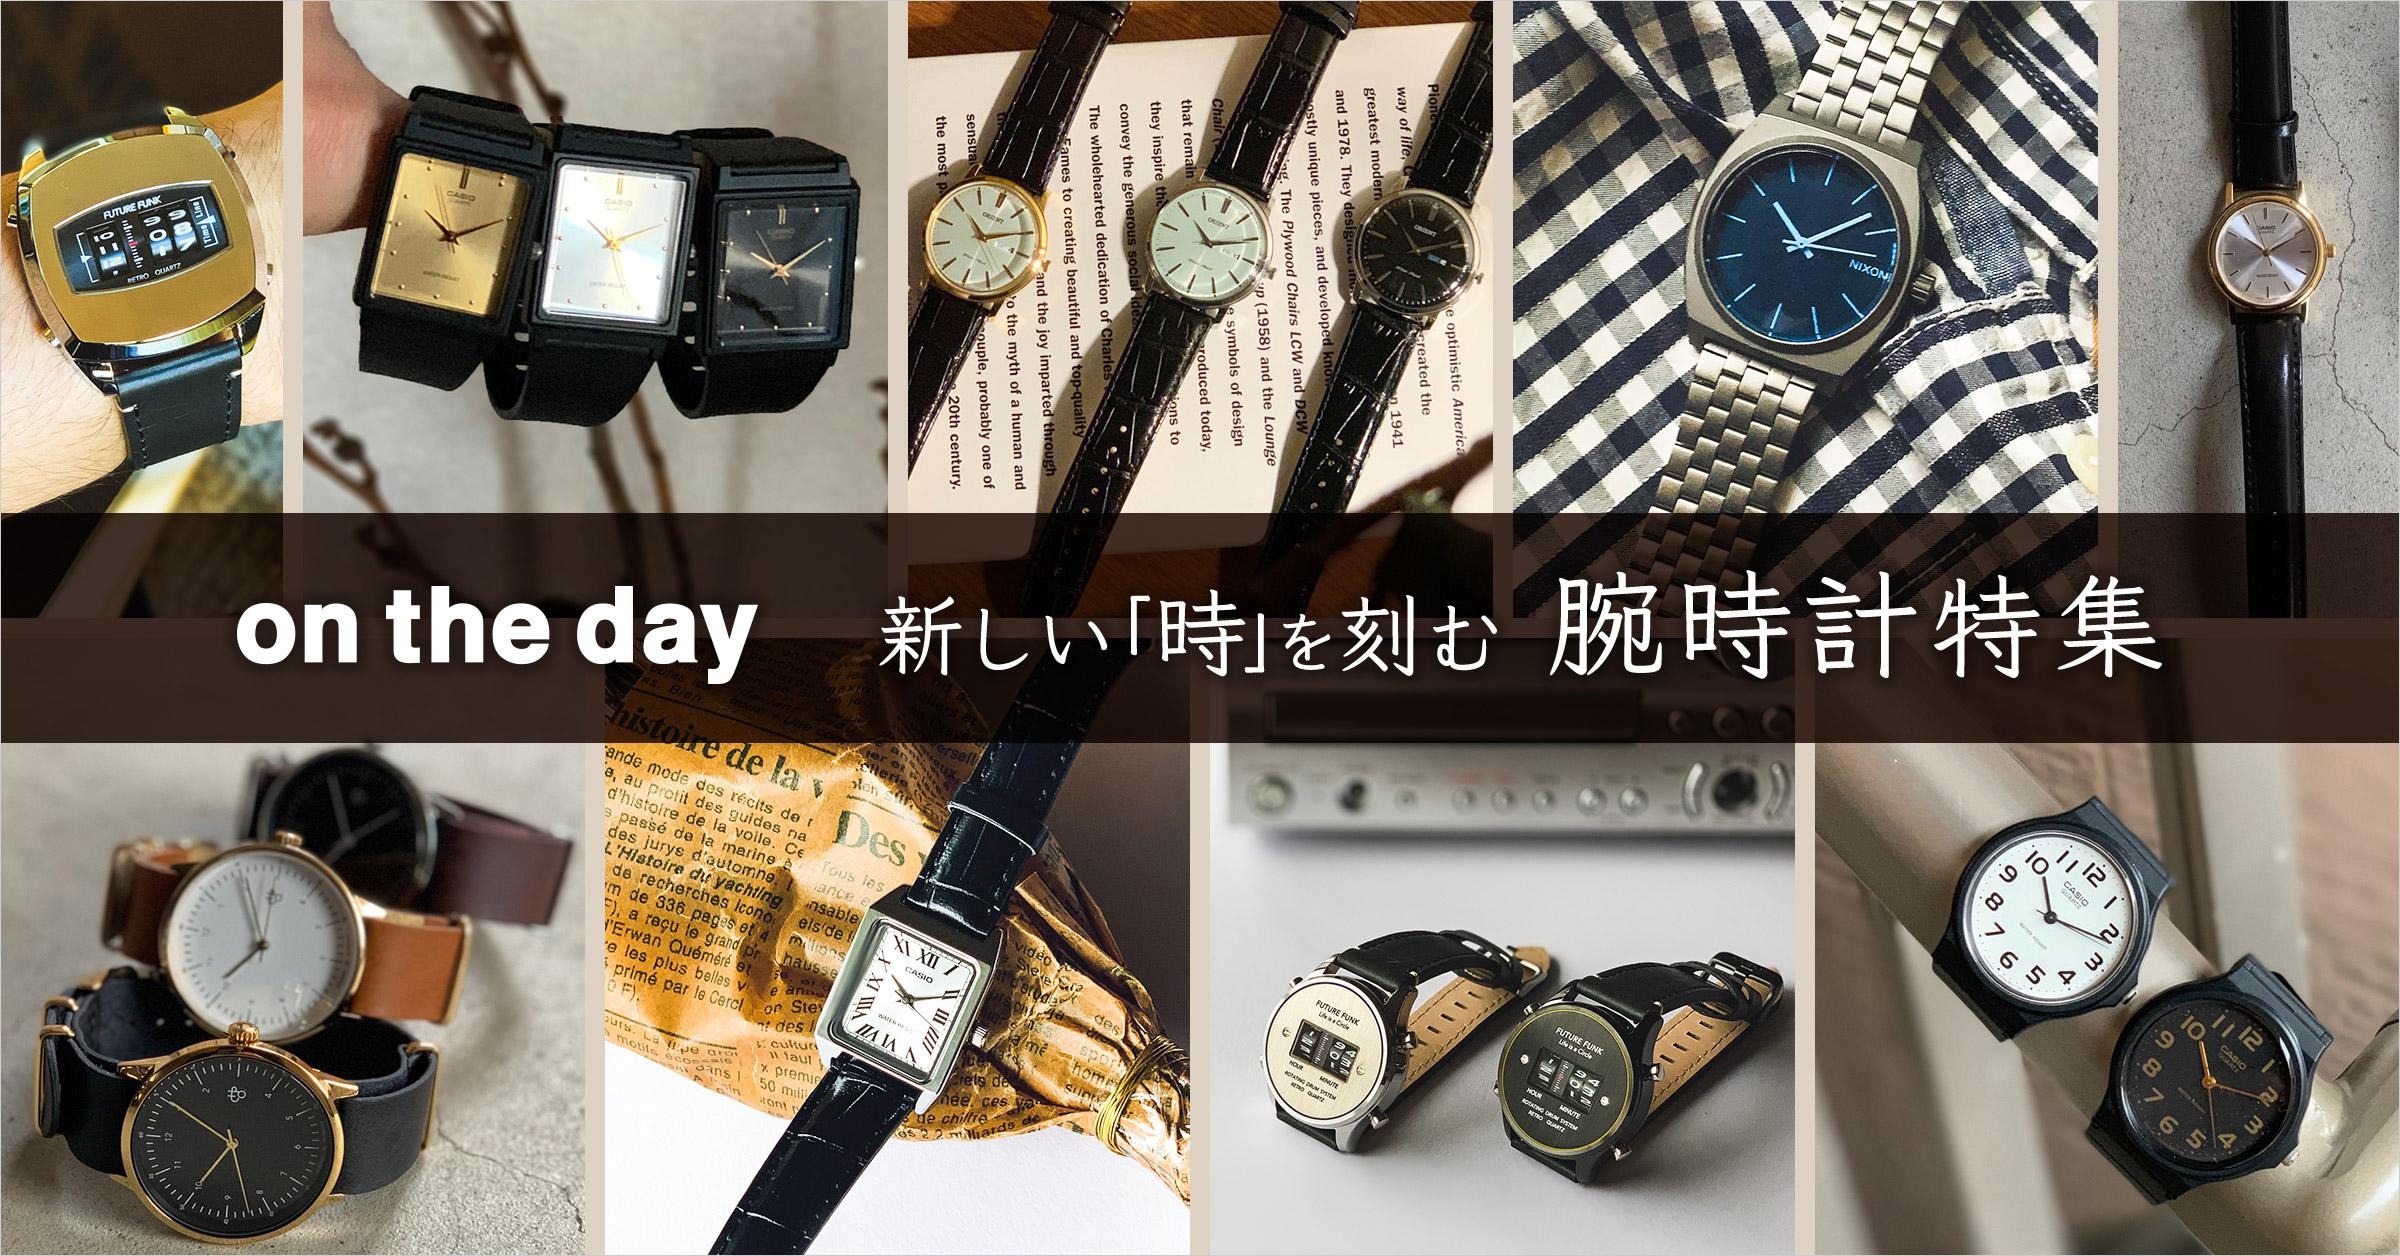 on the day(オン・ザ・ディ) 新しい「時」を刻む腕時計特集